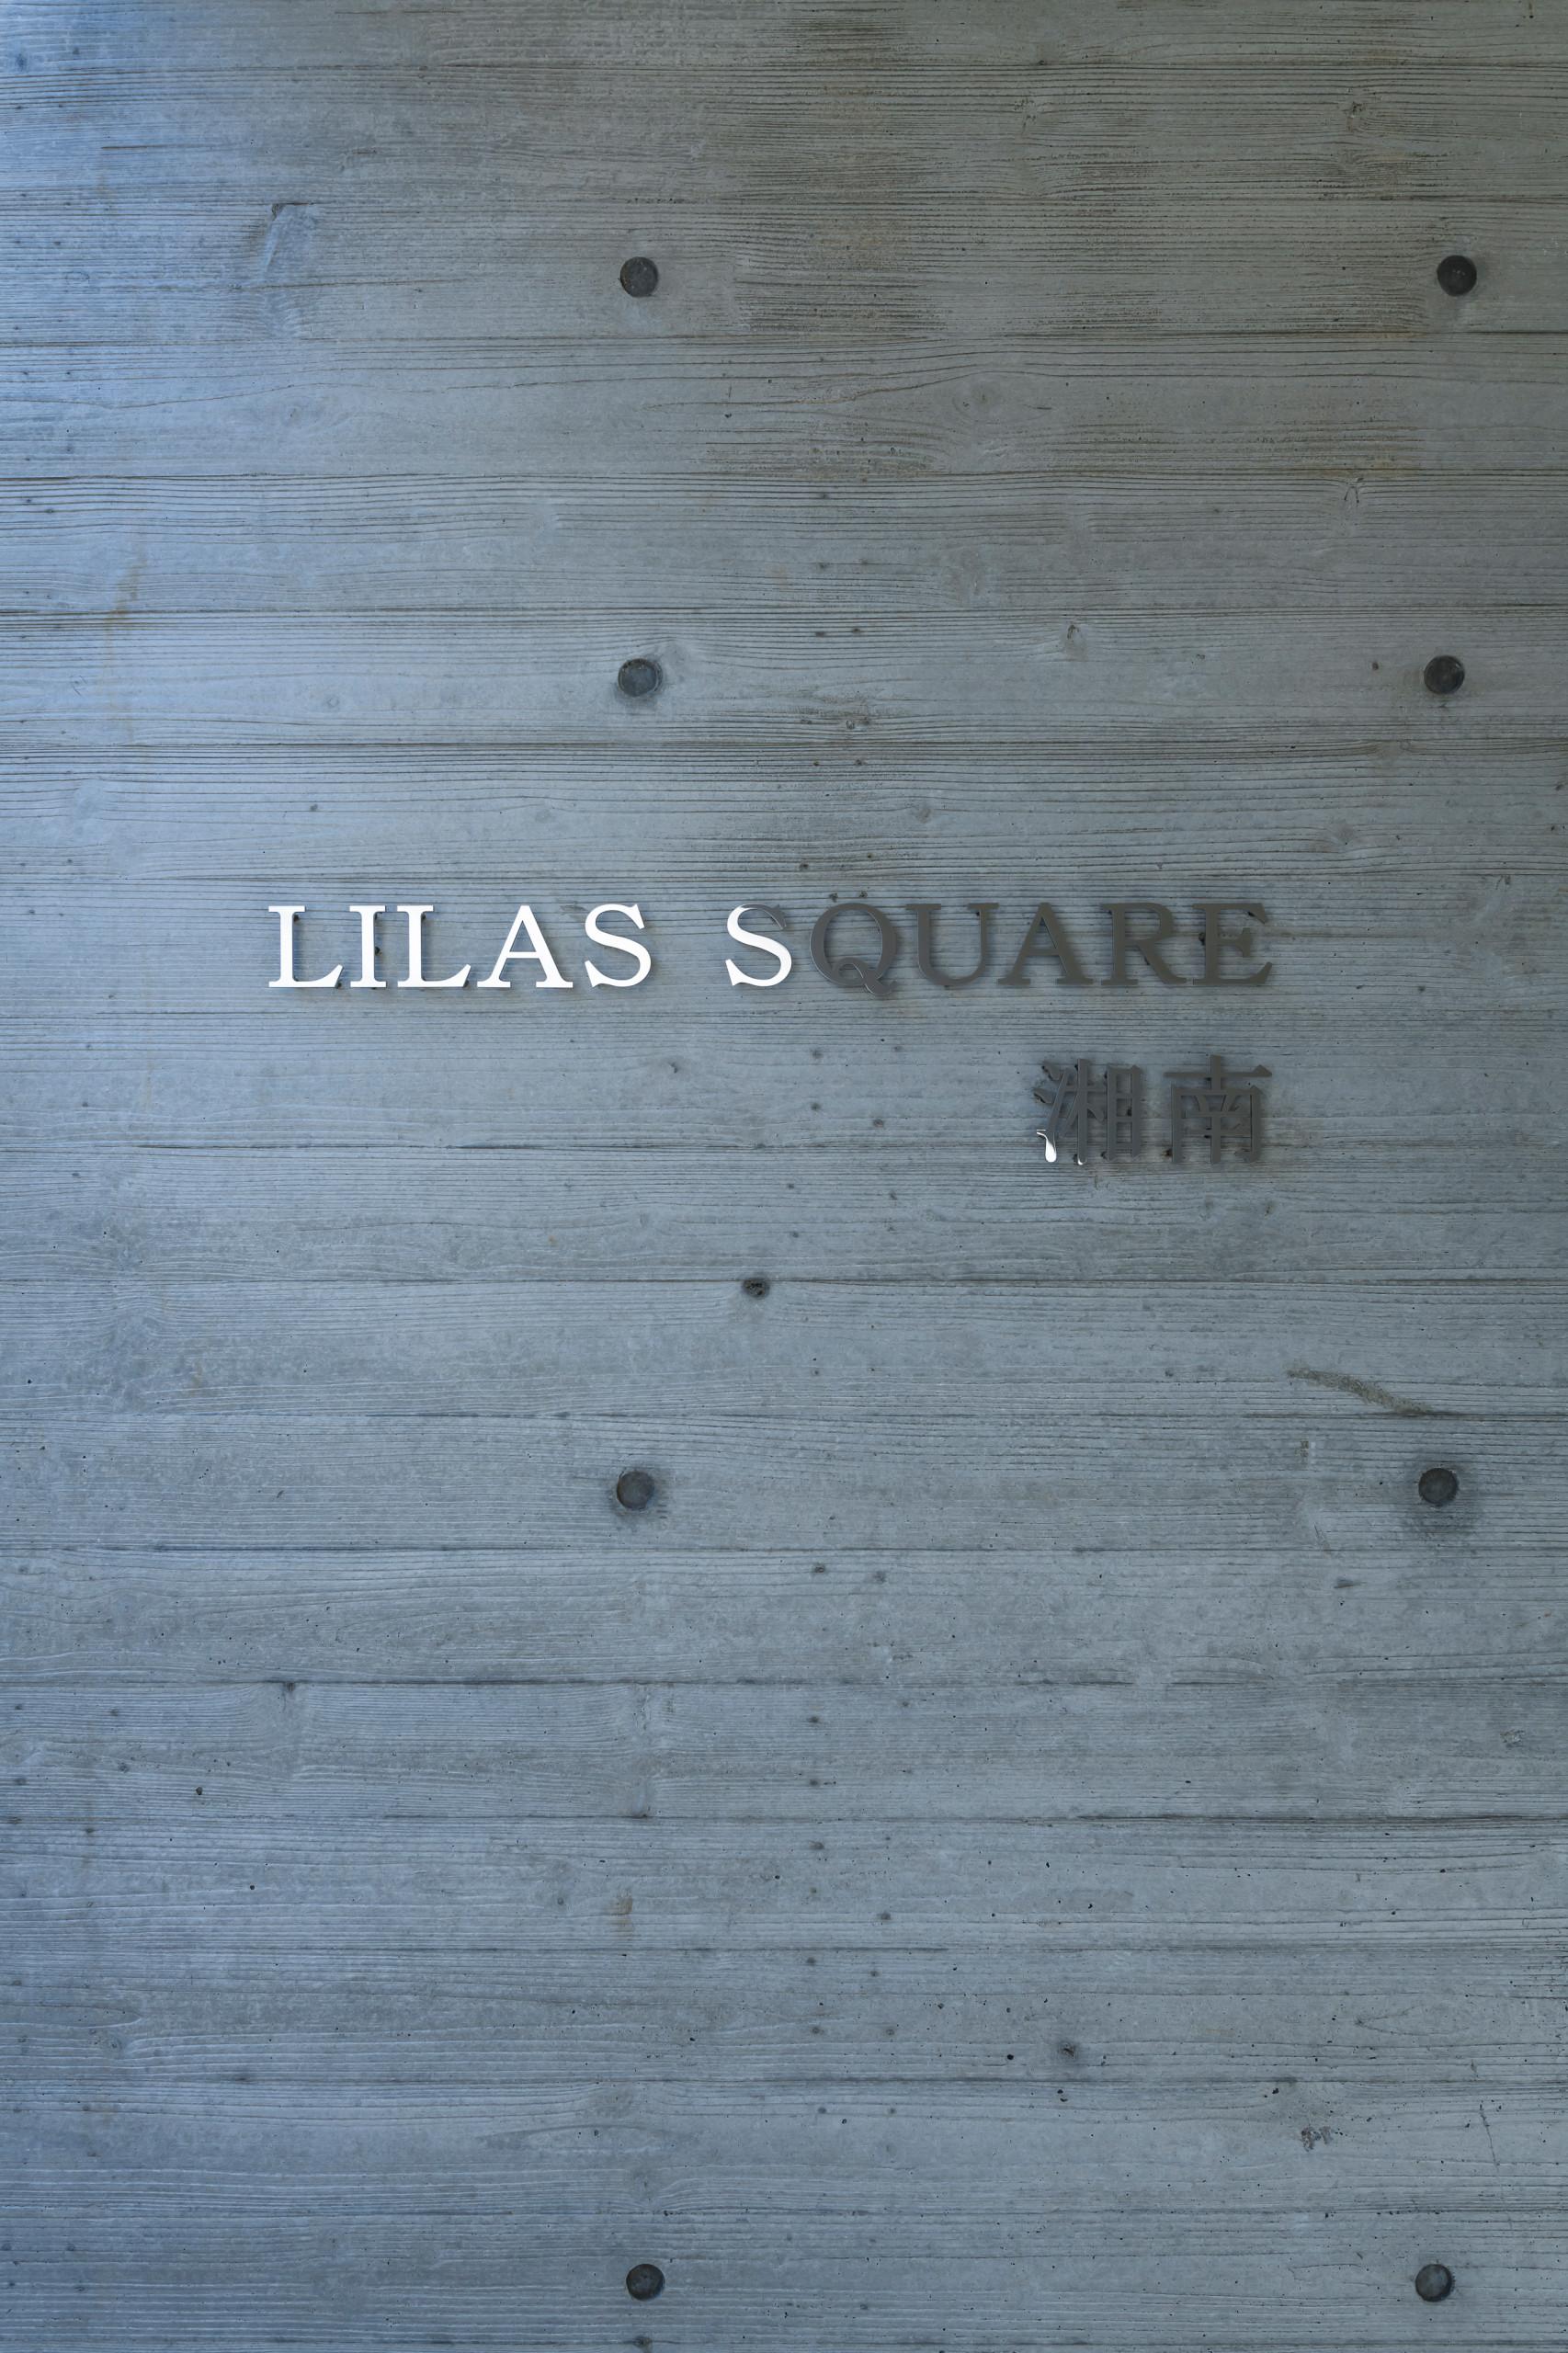 LILAS SQUARE-SHONAN